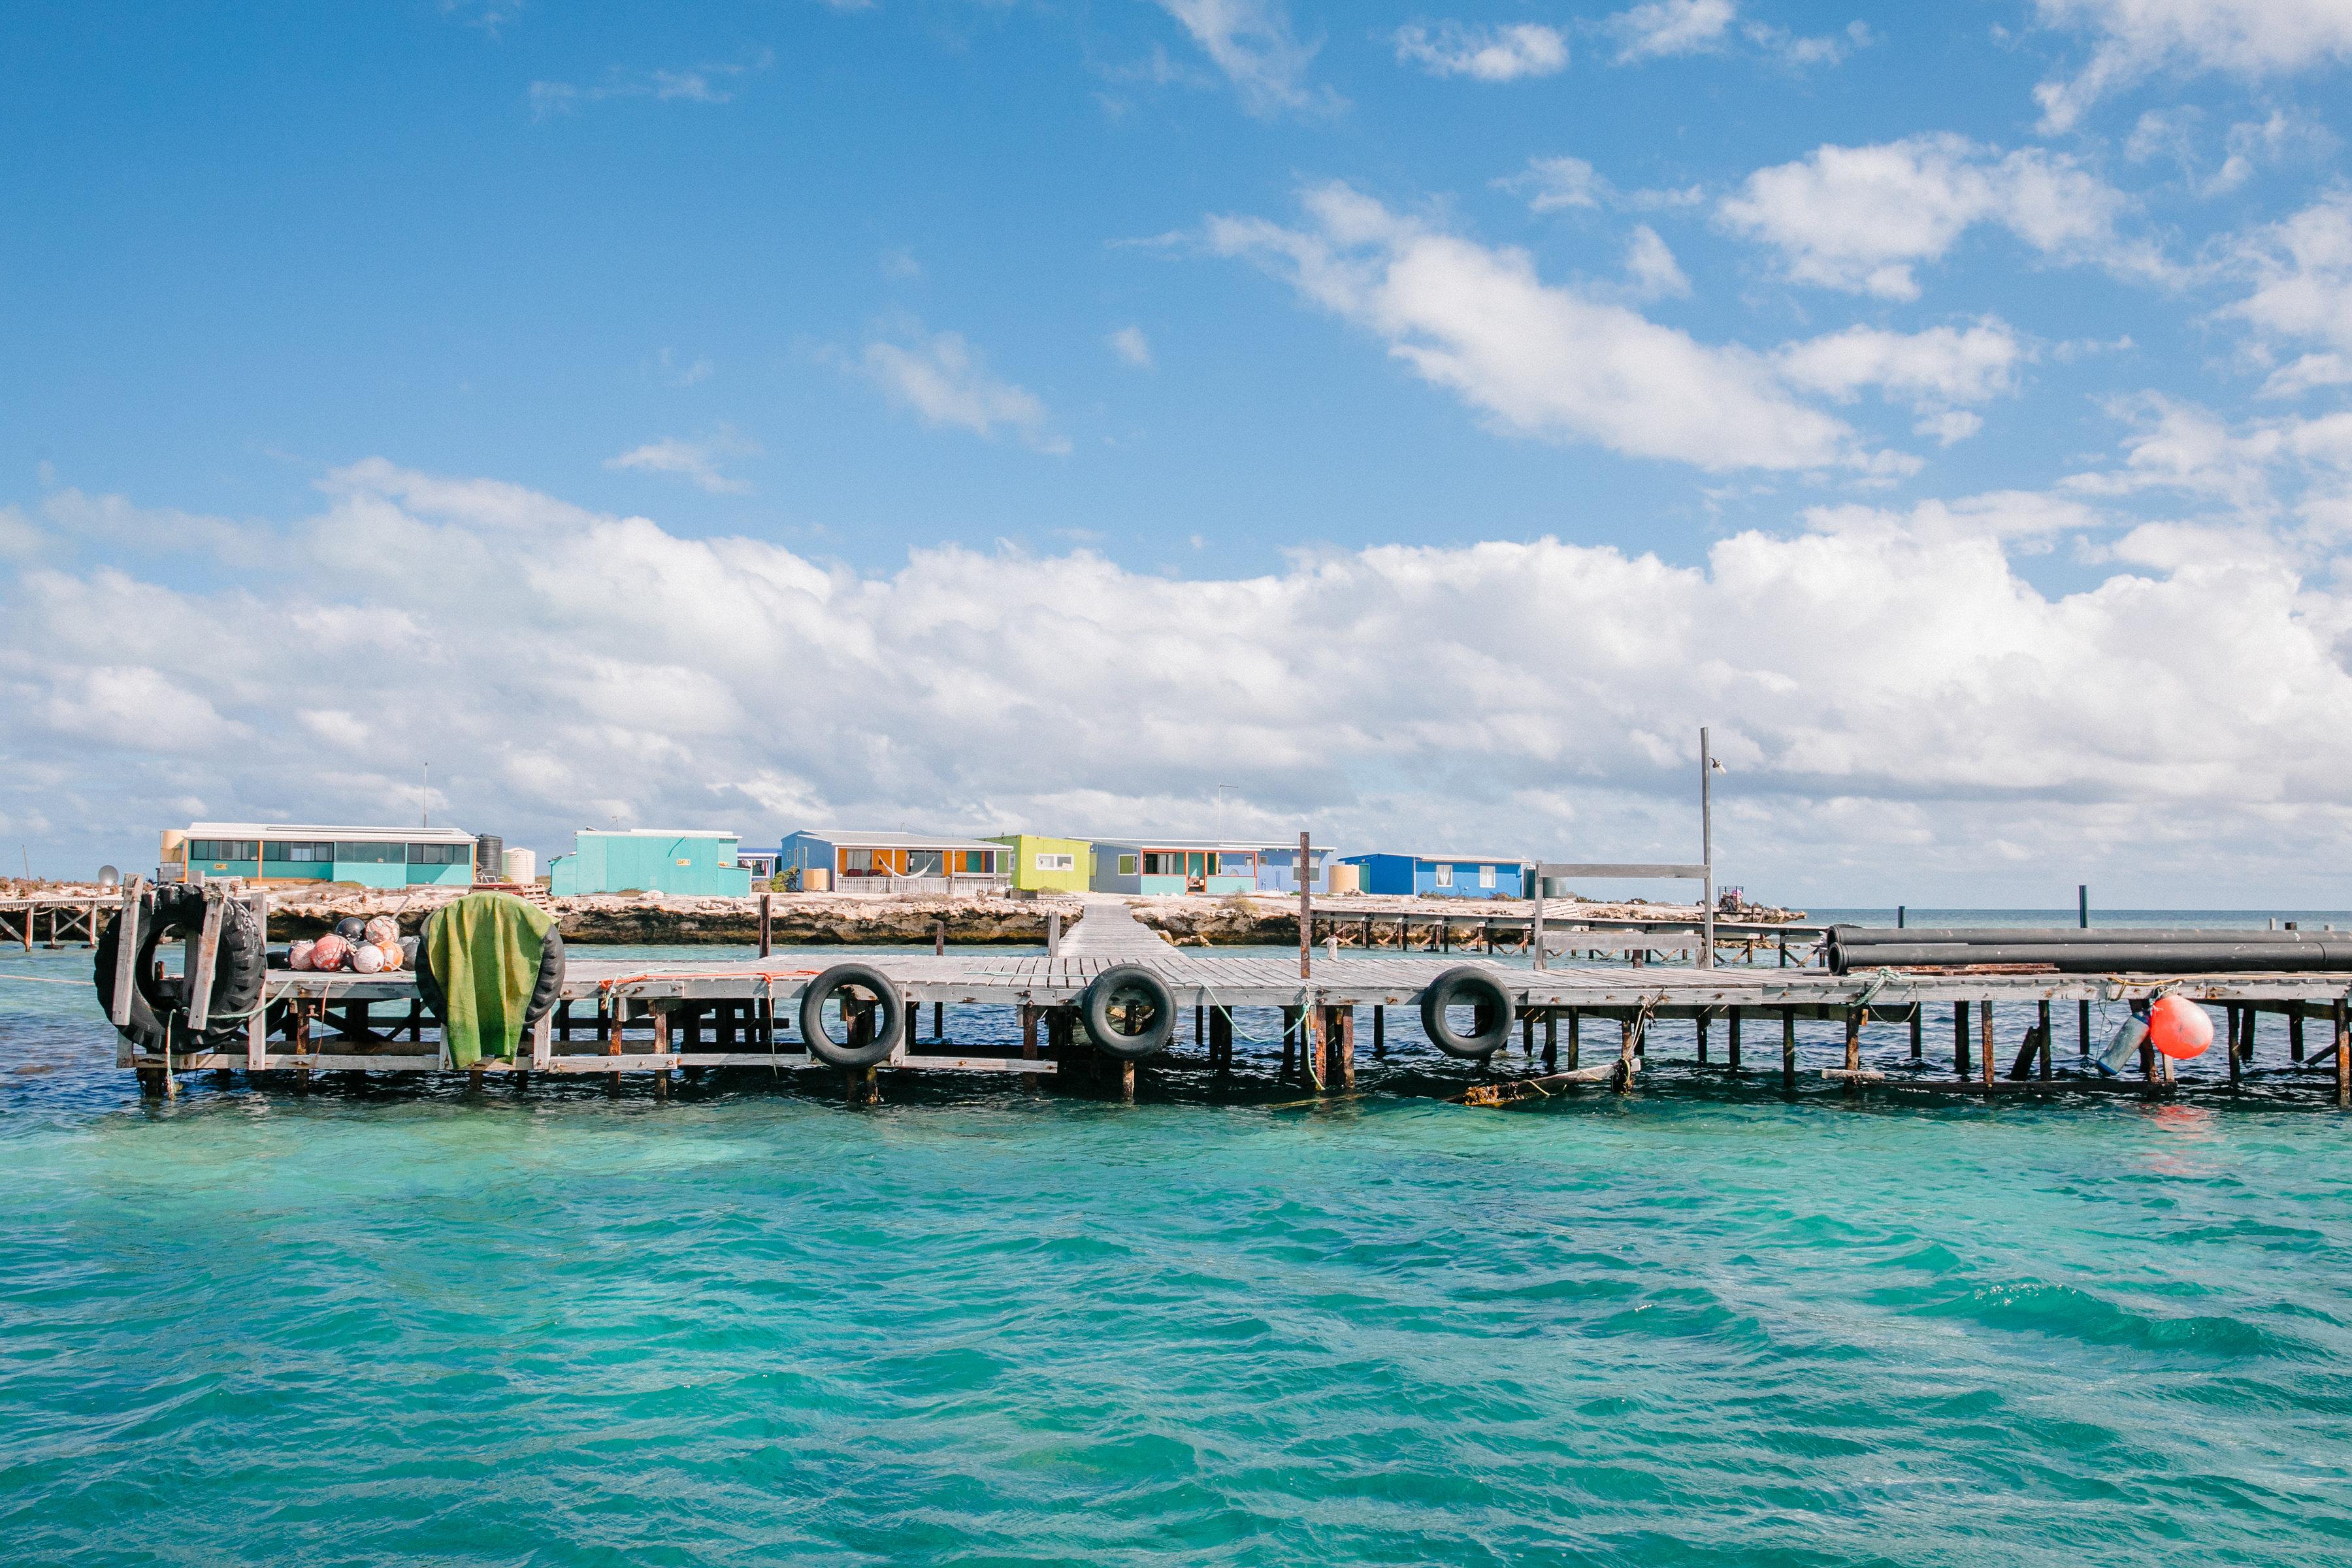 Houtman Abrolhos islands